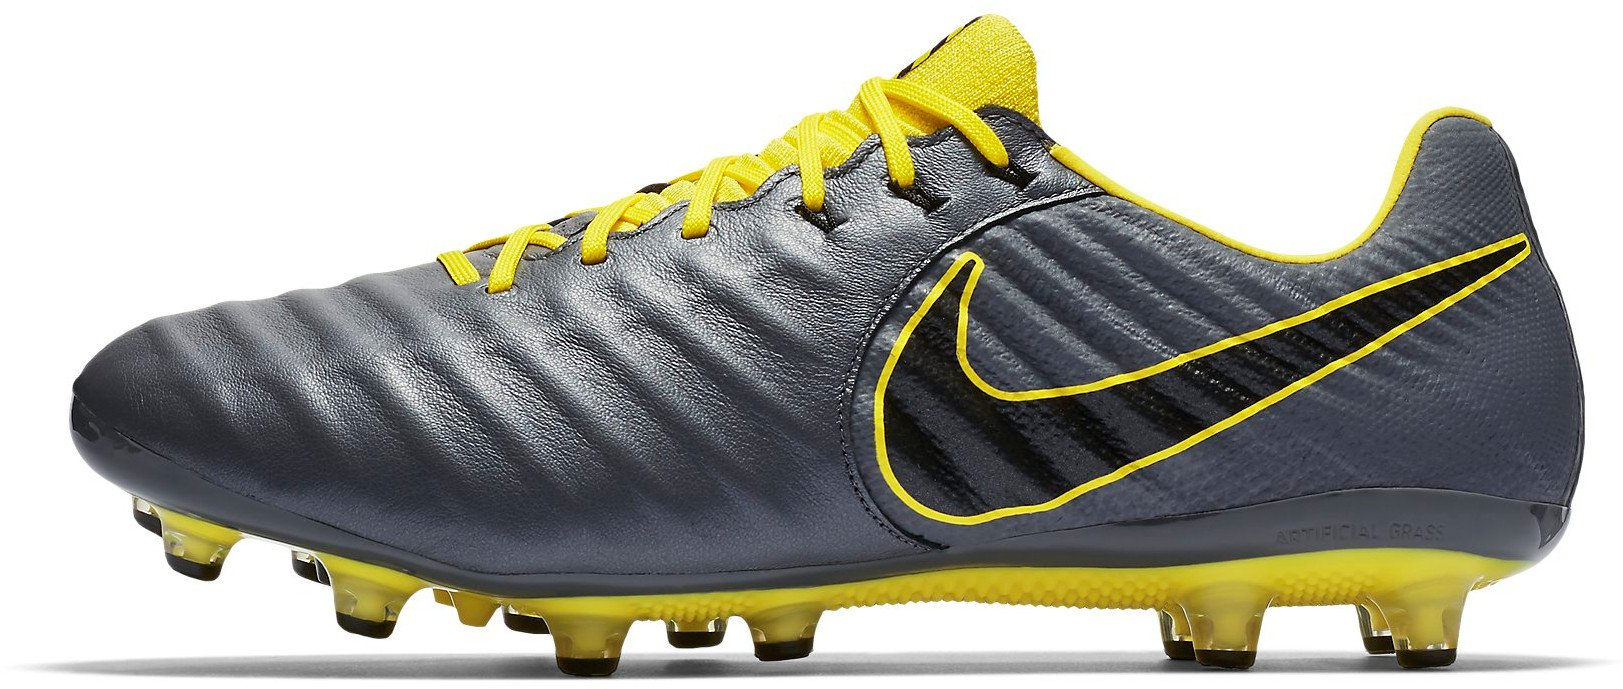 Kopačky Nike LEGEND 7 ELITE AG-PRO šedá